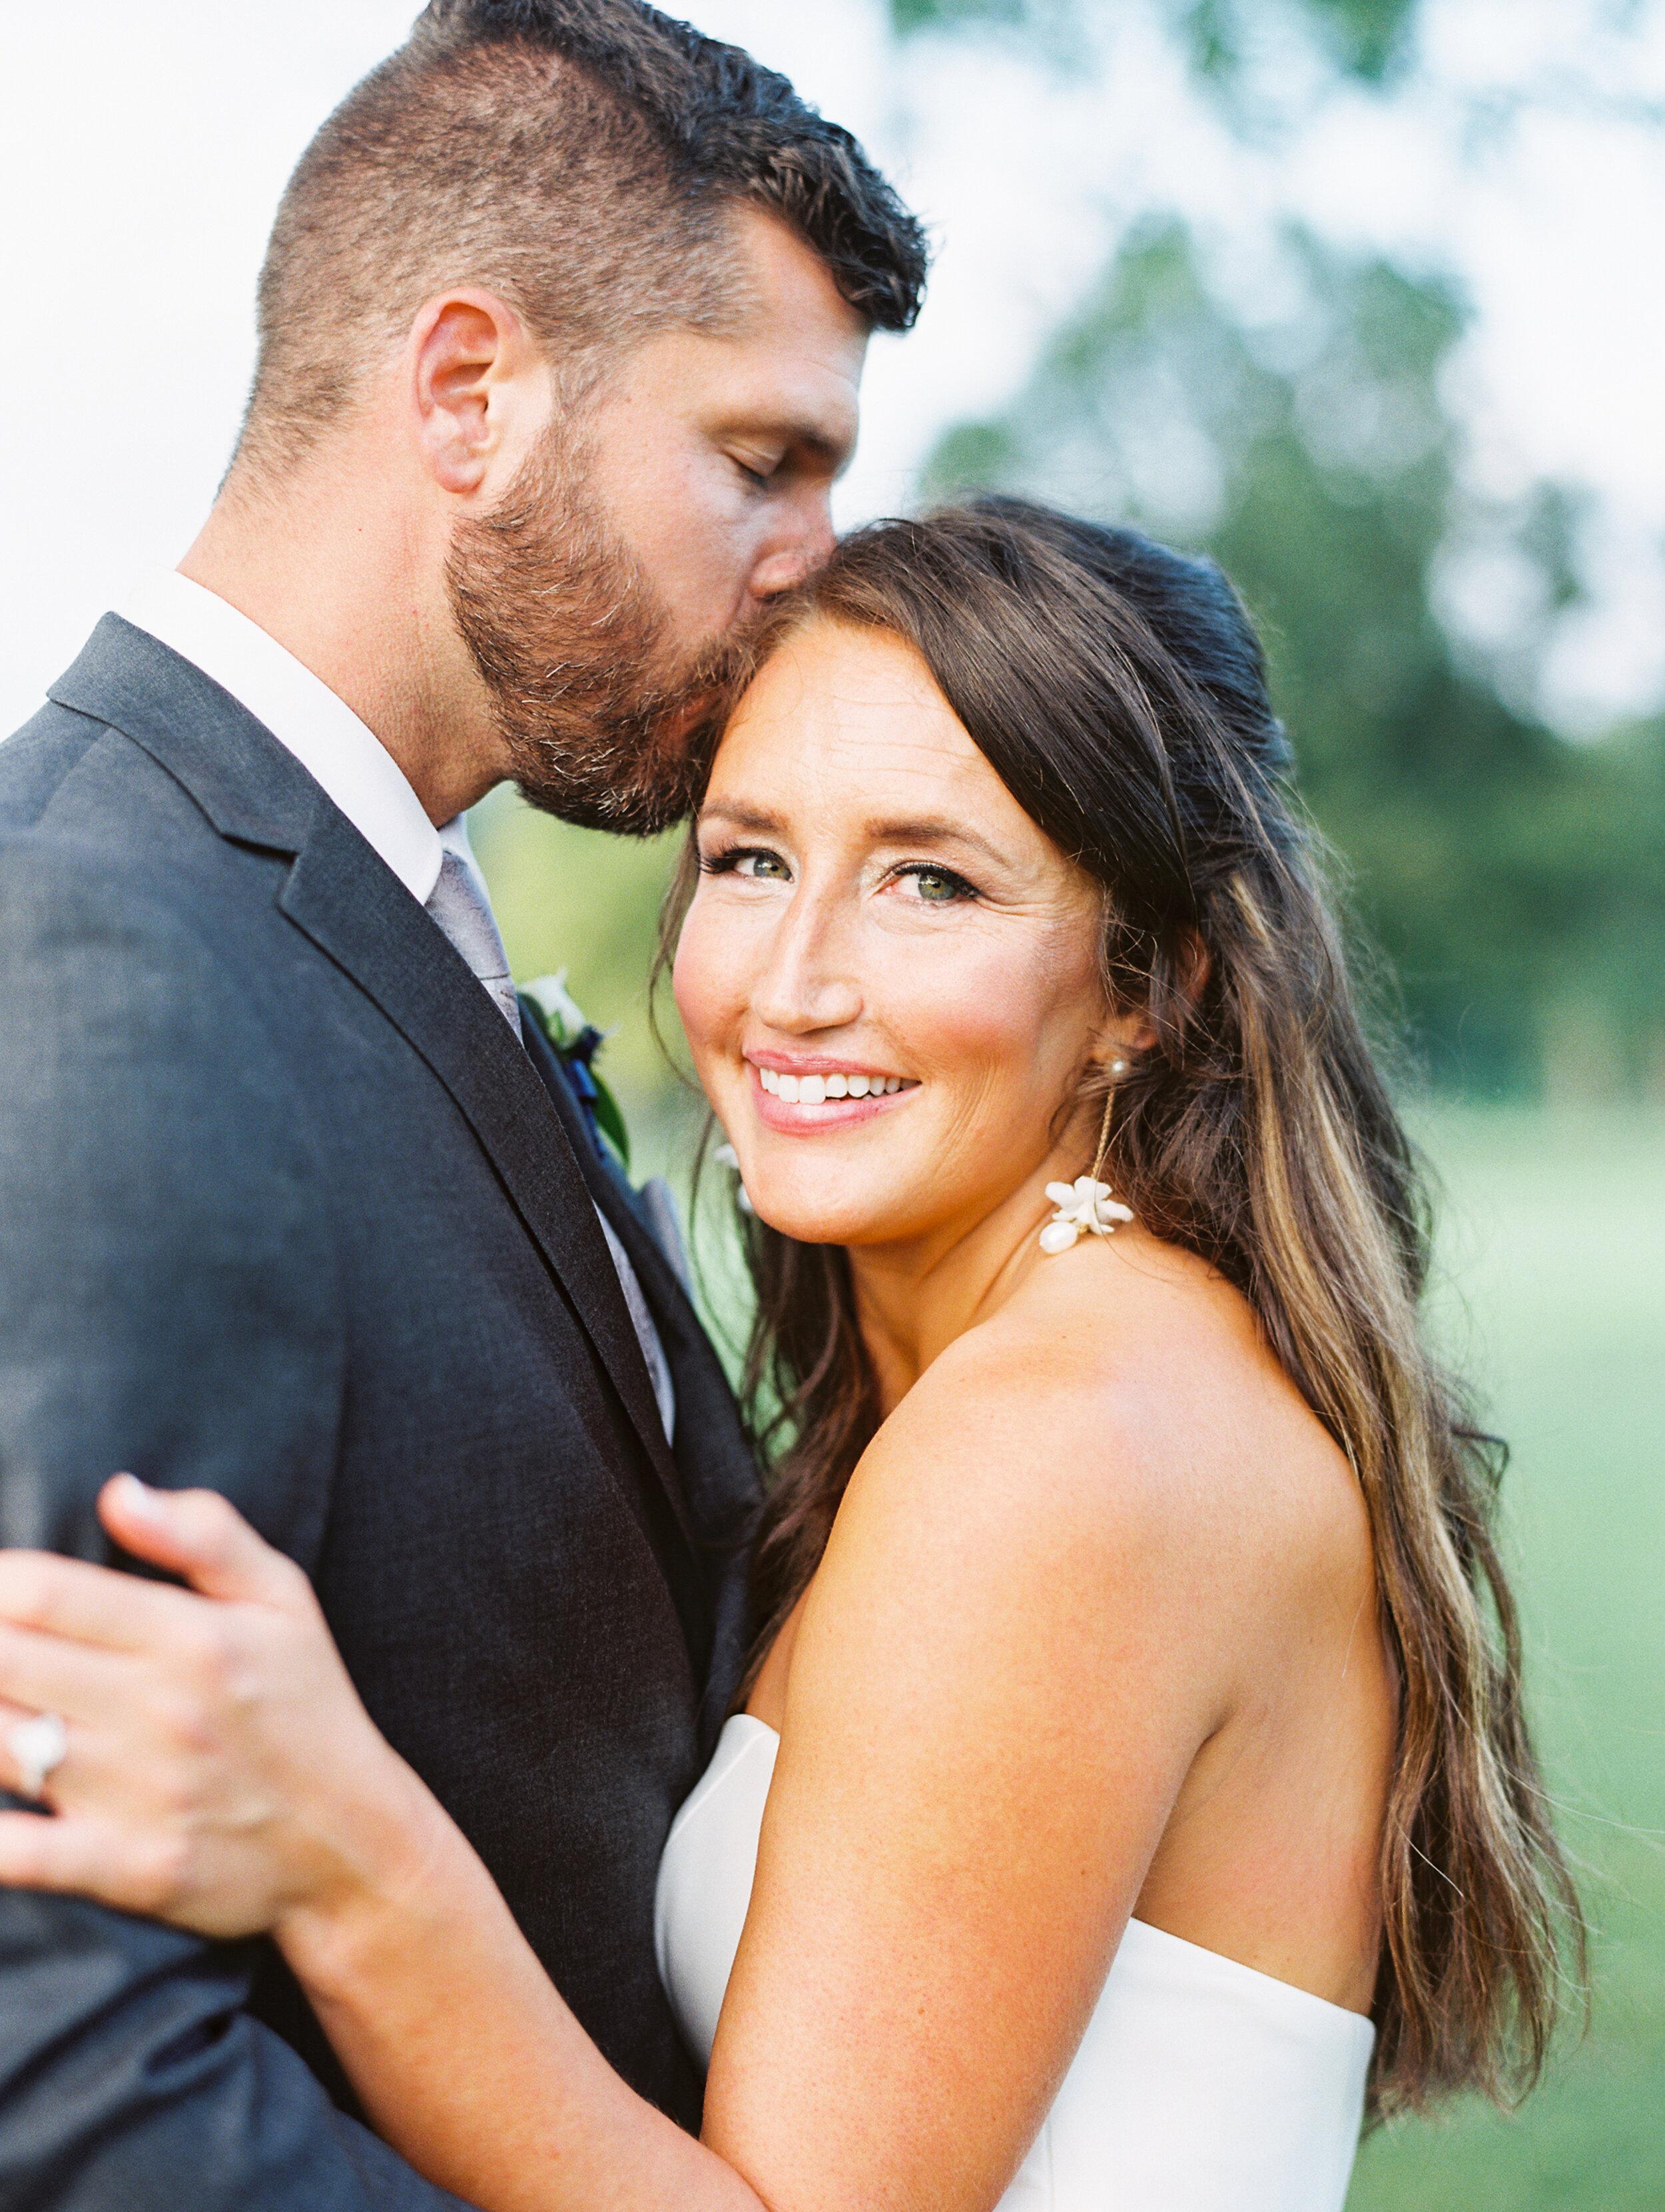 Kuiper+Wedding+Reception+Bridal+Party-150.jpg